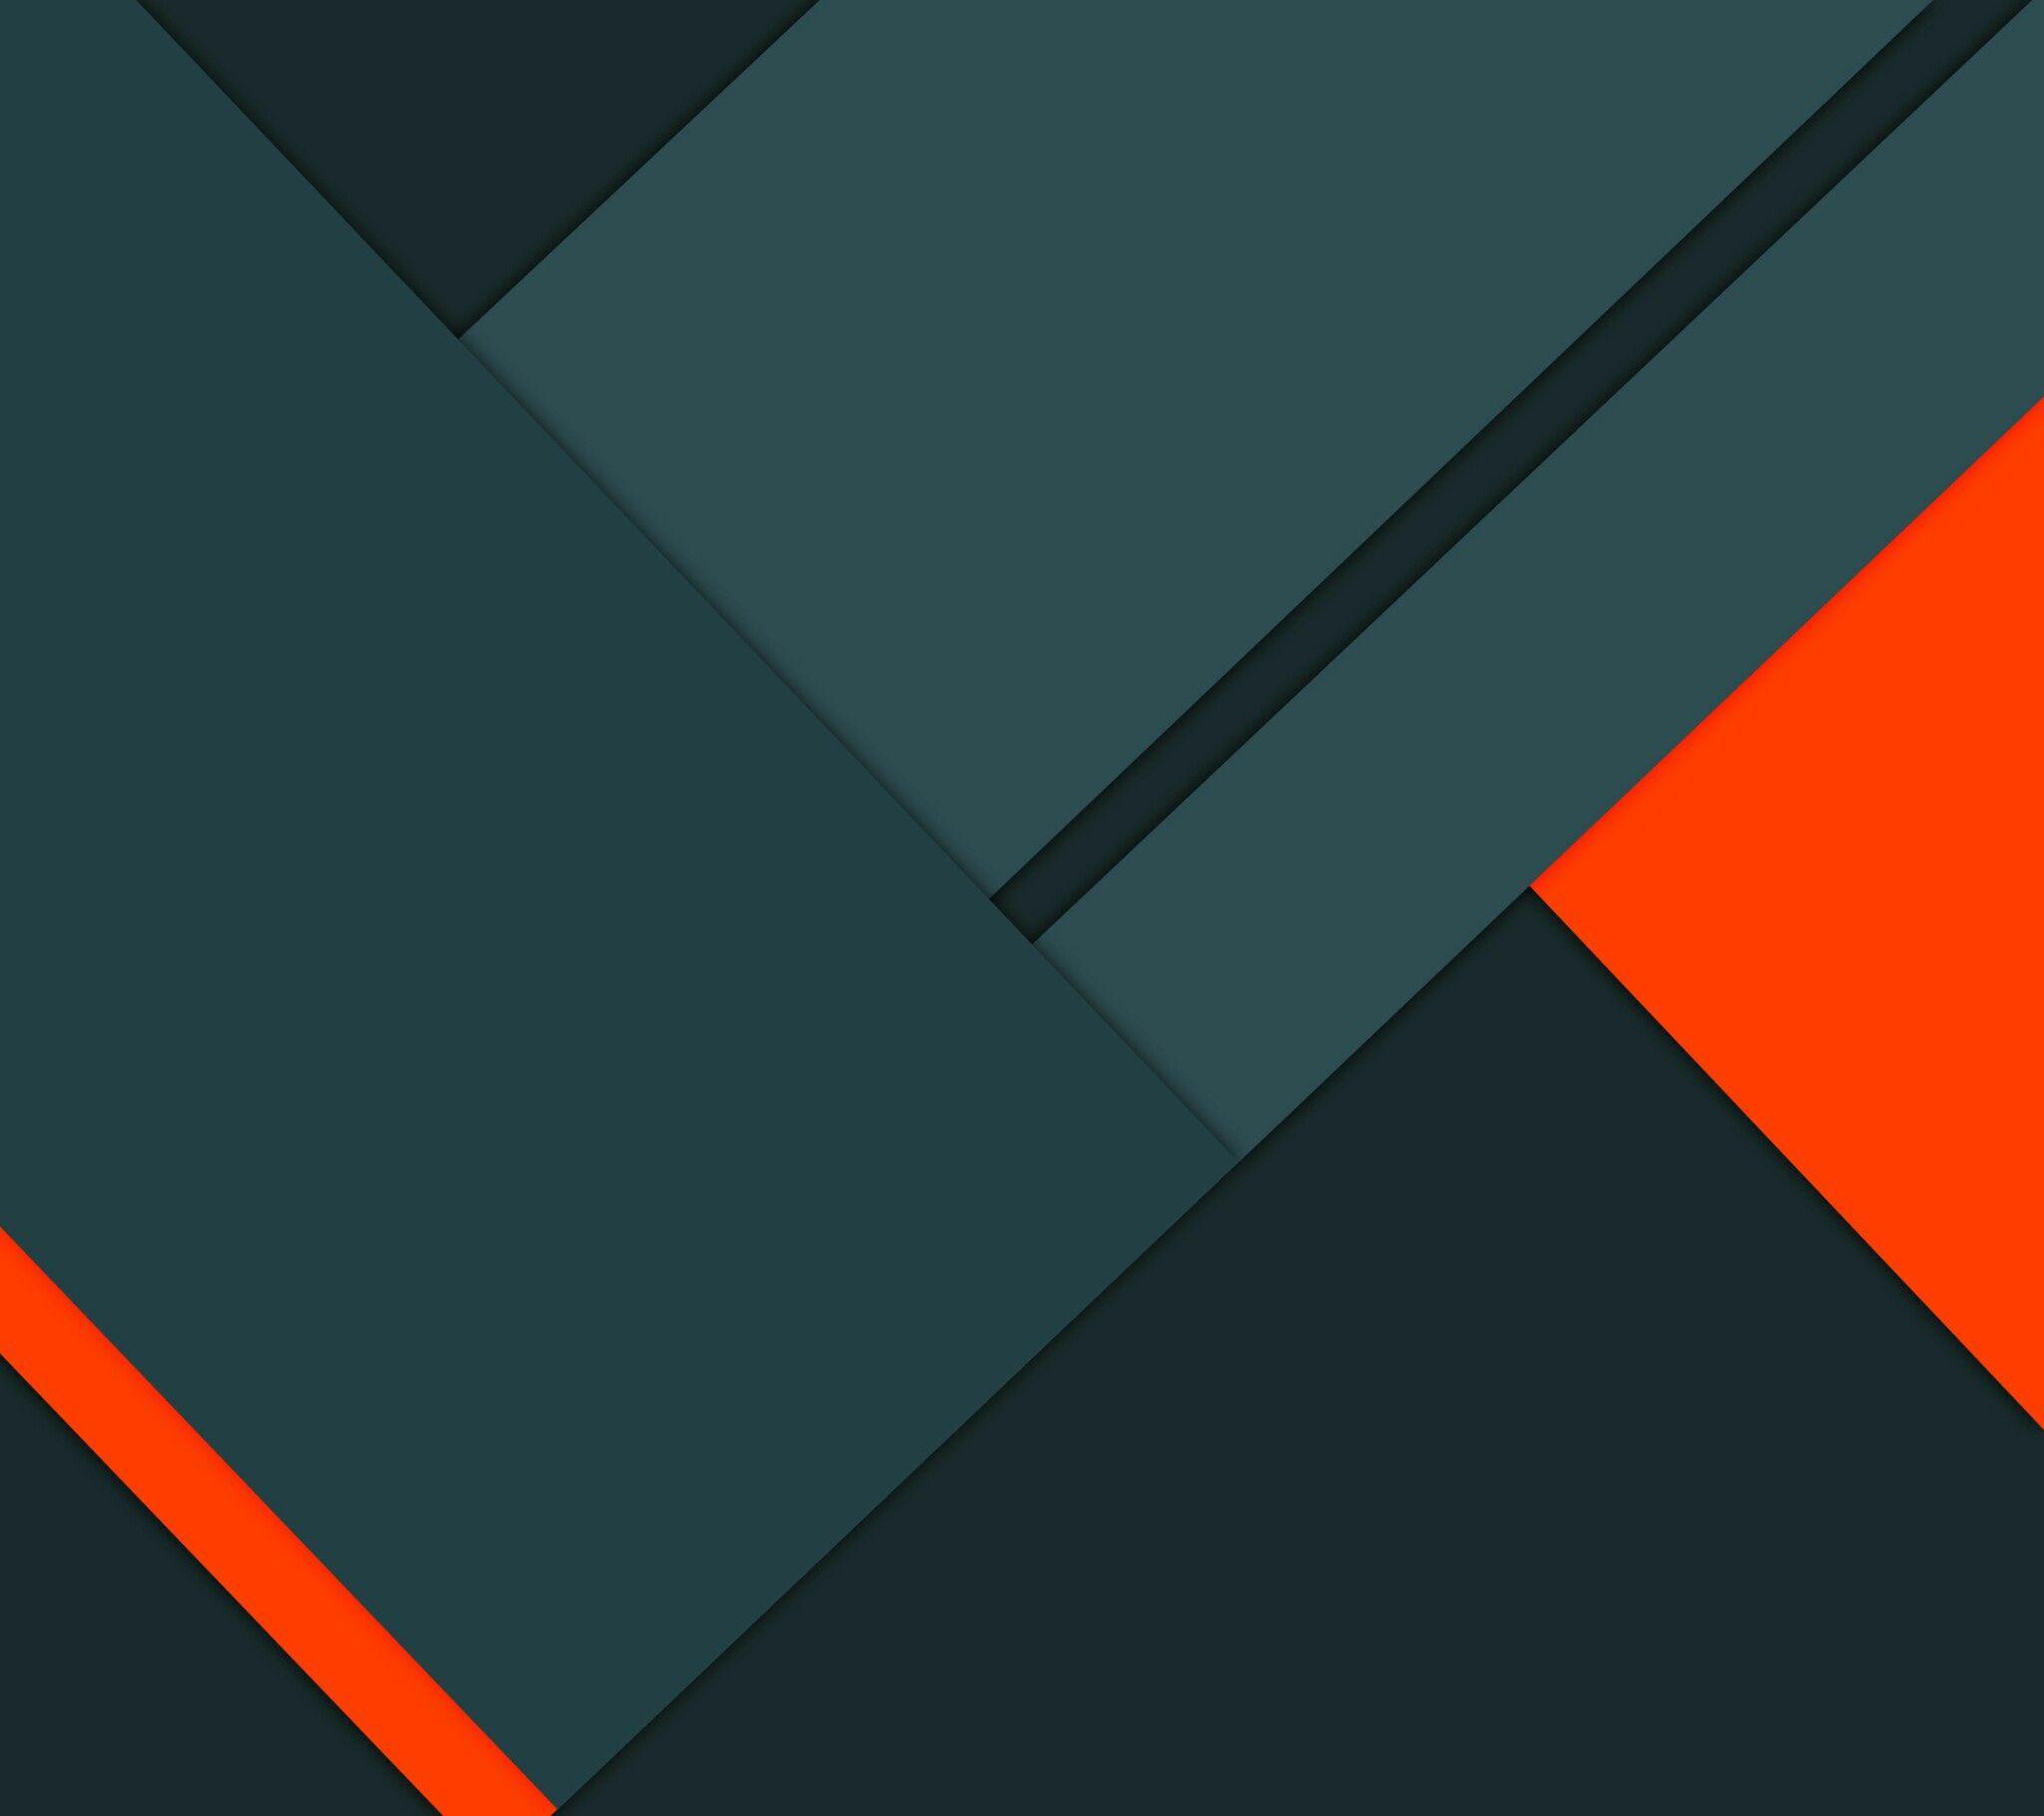 Material Wallpaper - QyGjxZ